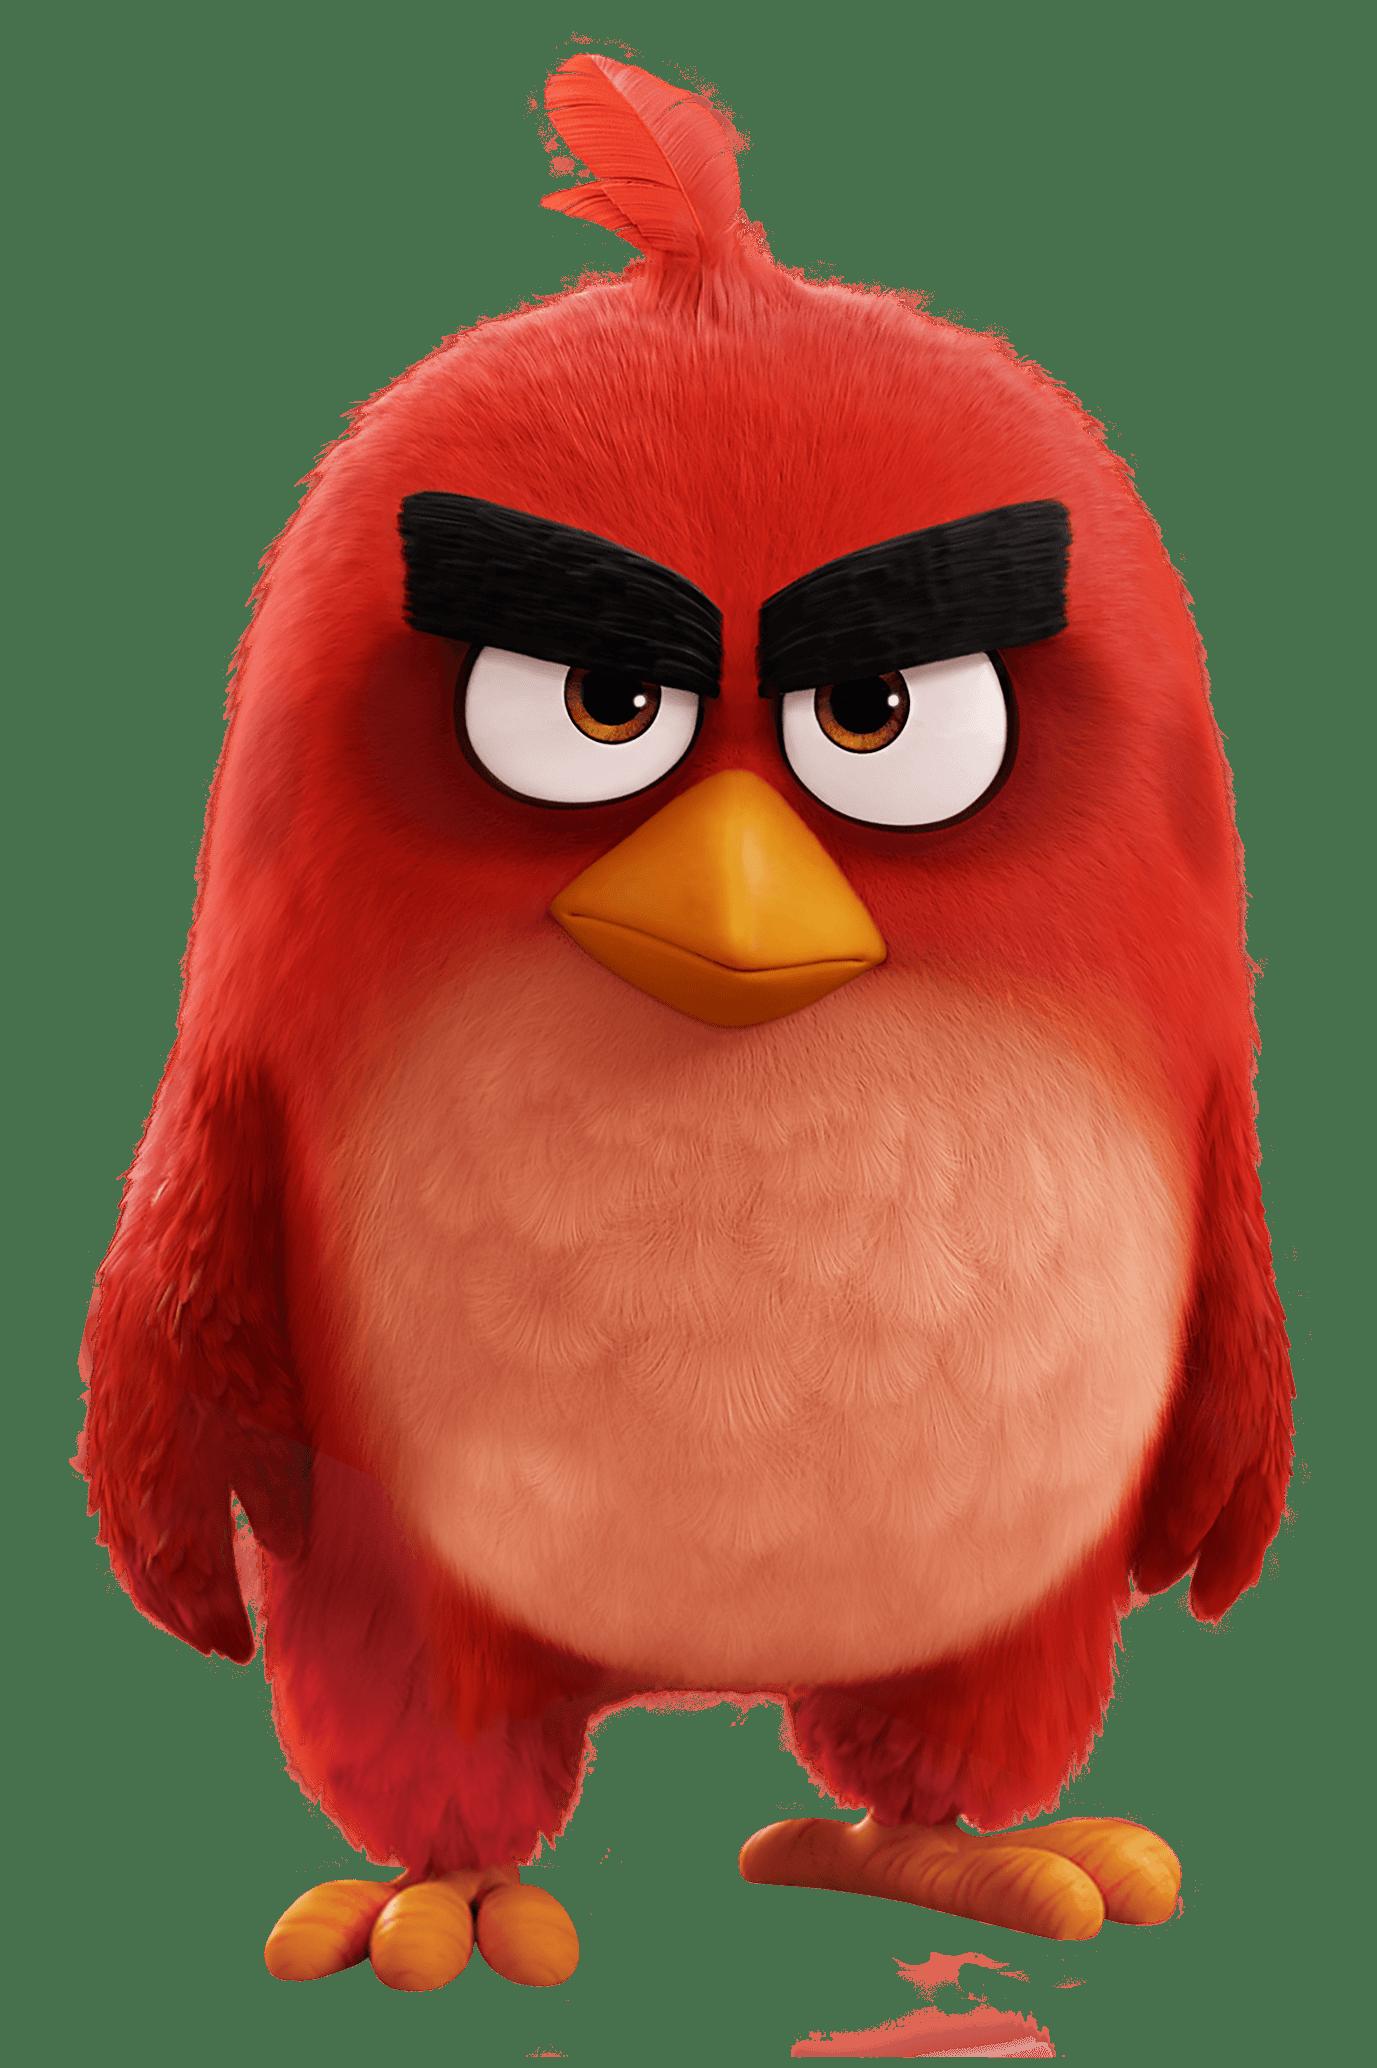 1377x2068 Angry Birds Movie Red Bird Teaching Art 101 Angry